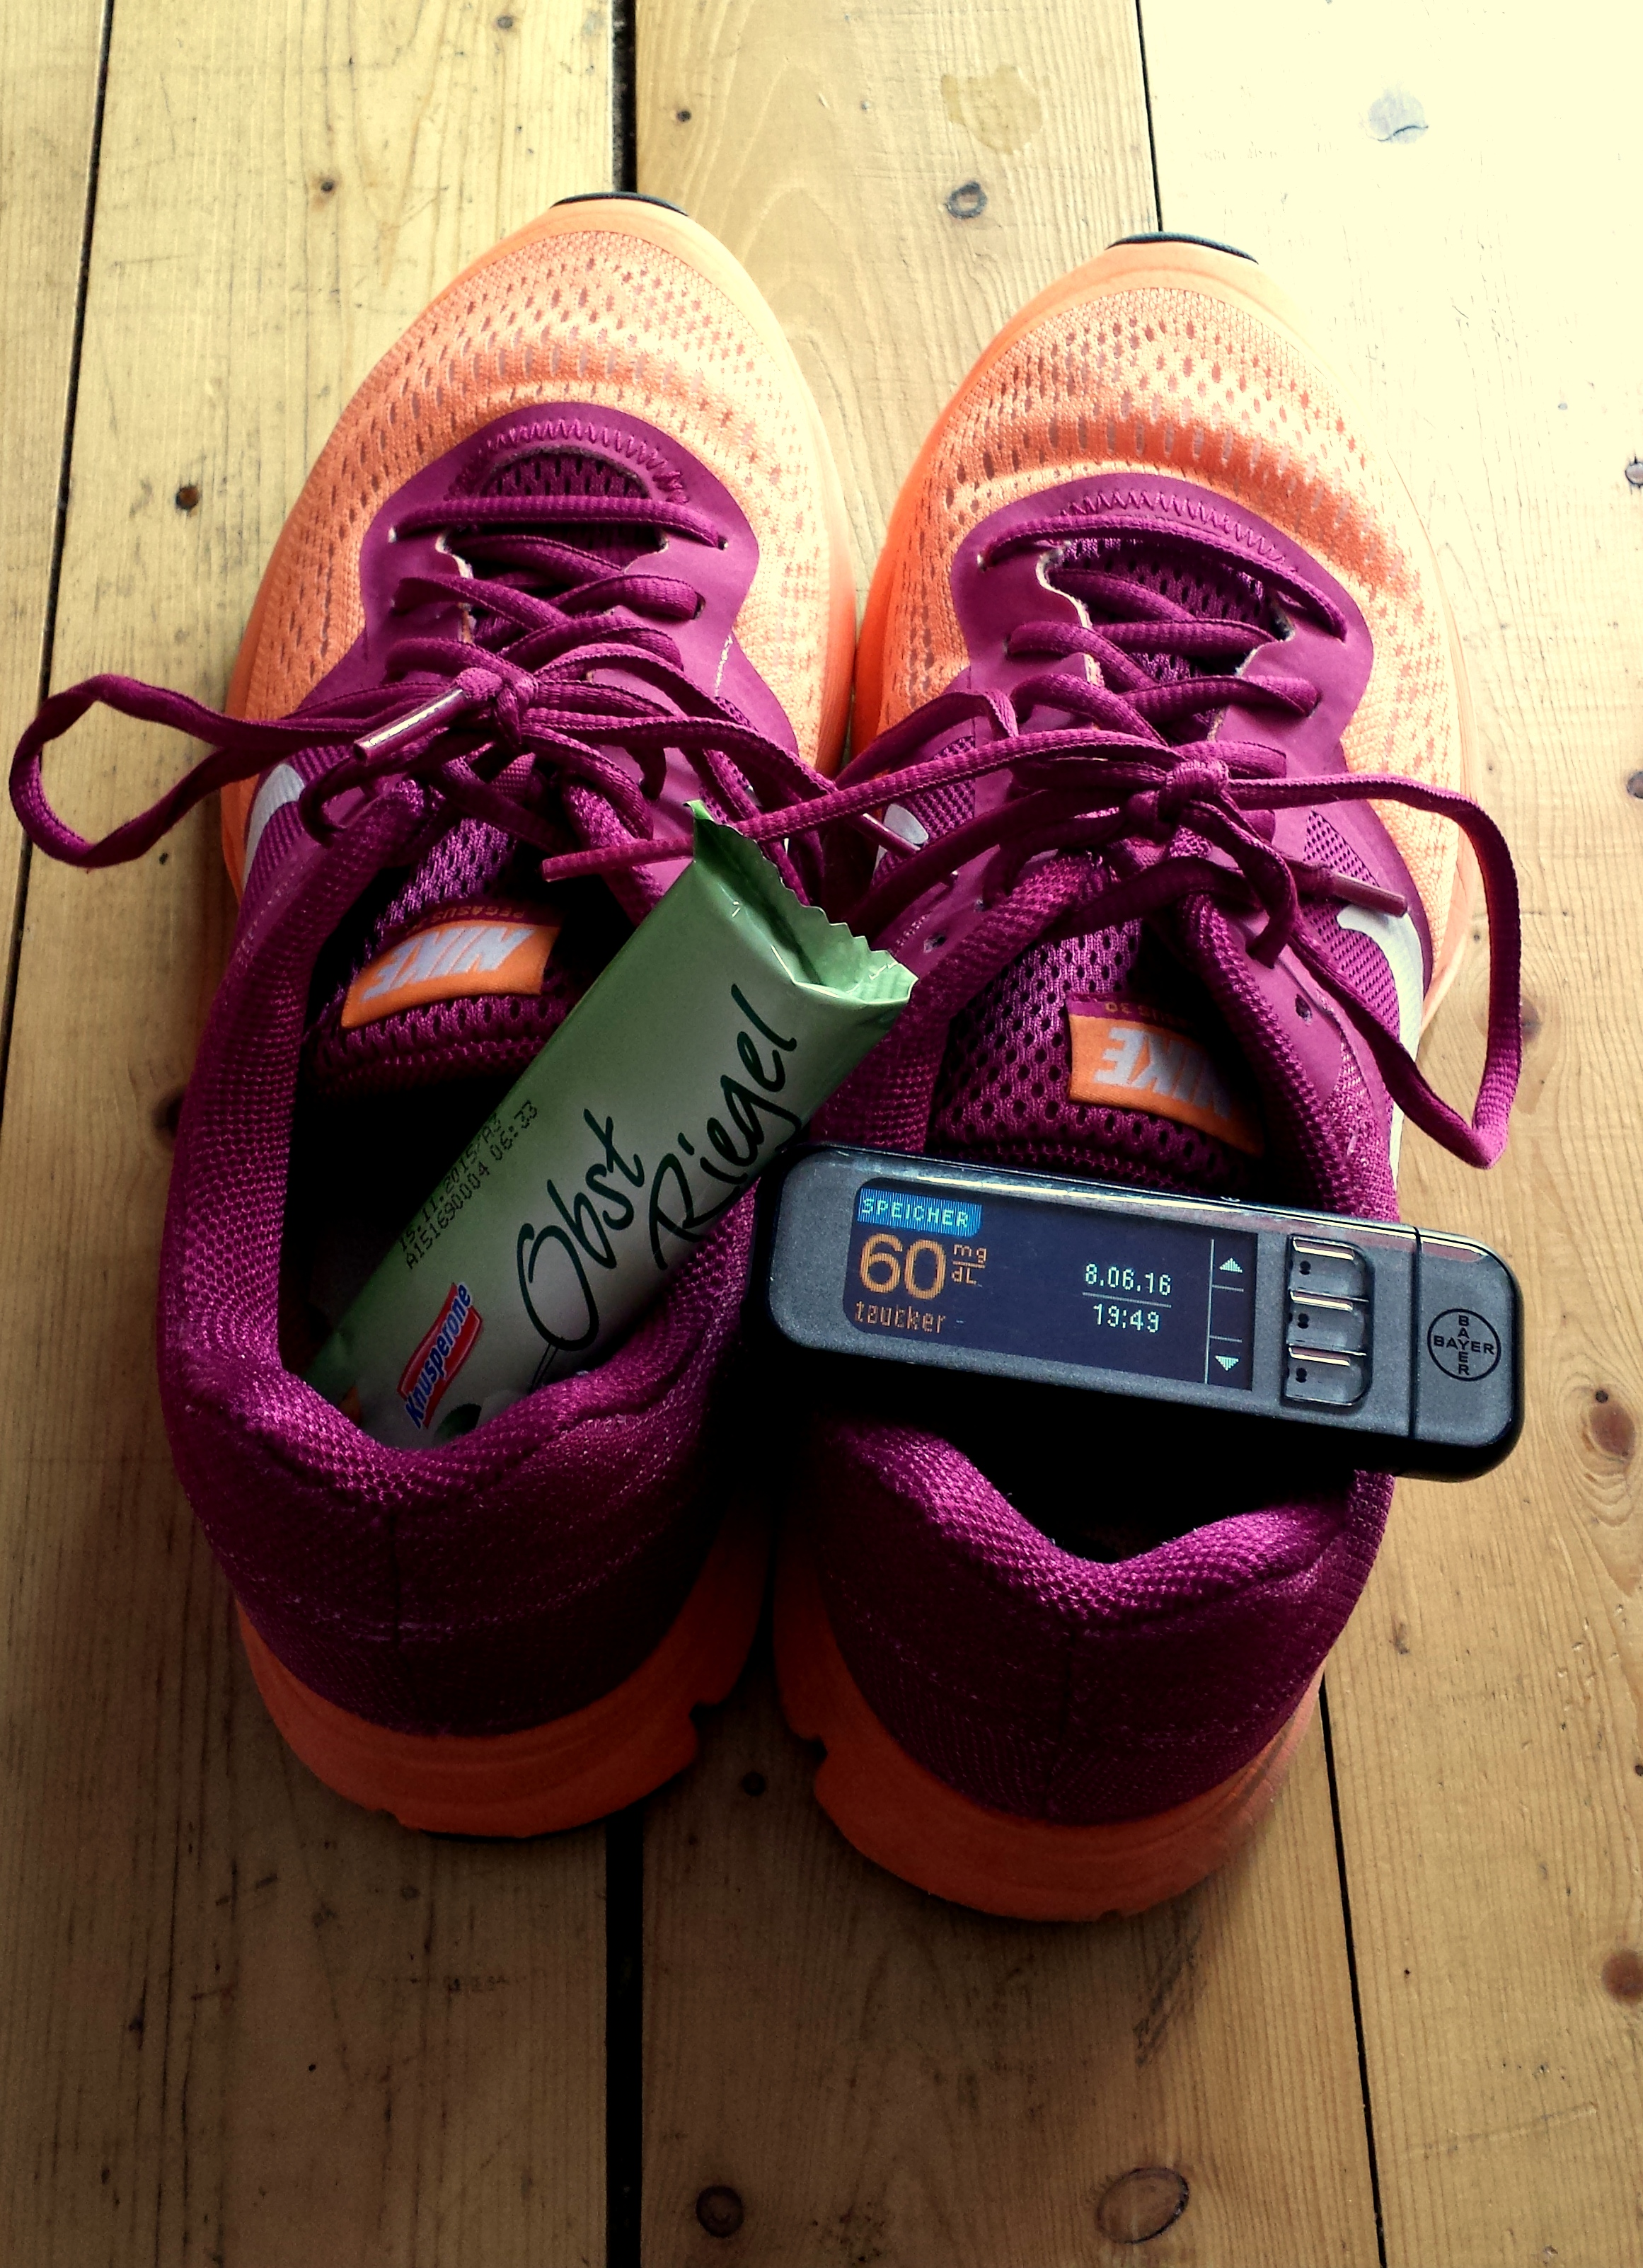 Leben ohne Diabetes Sport